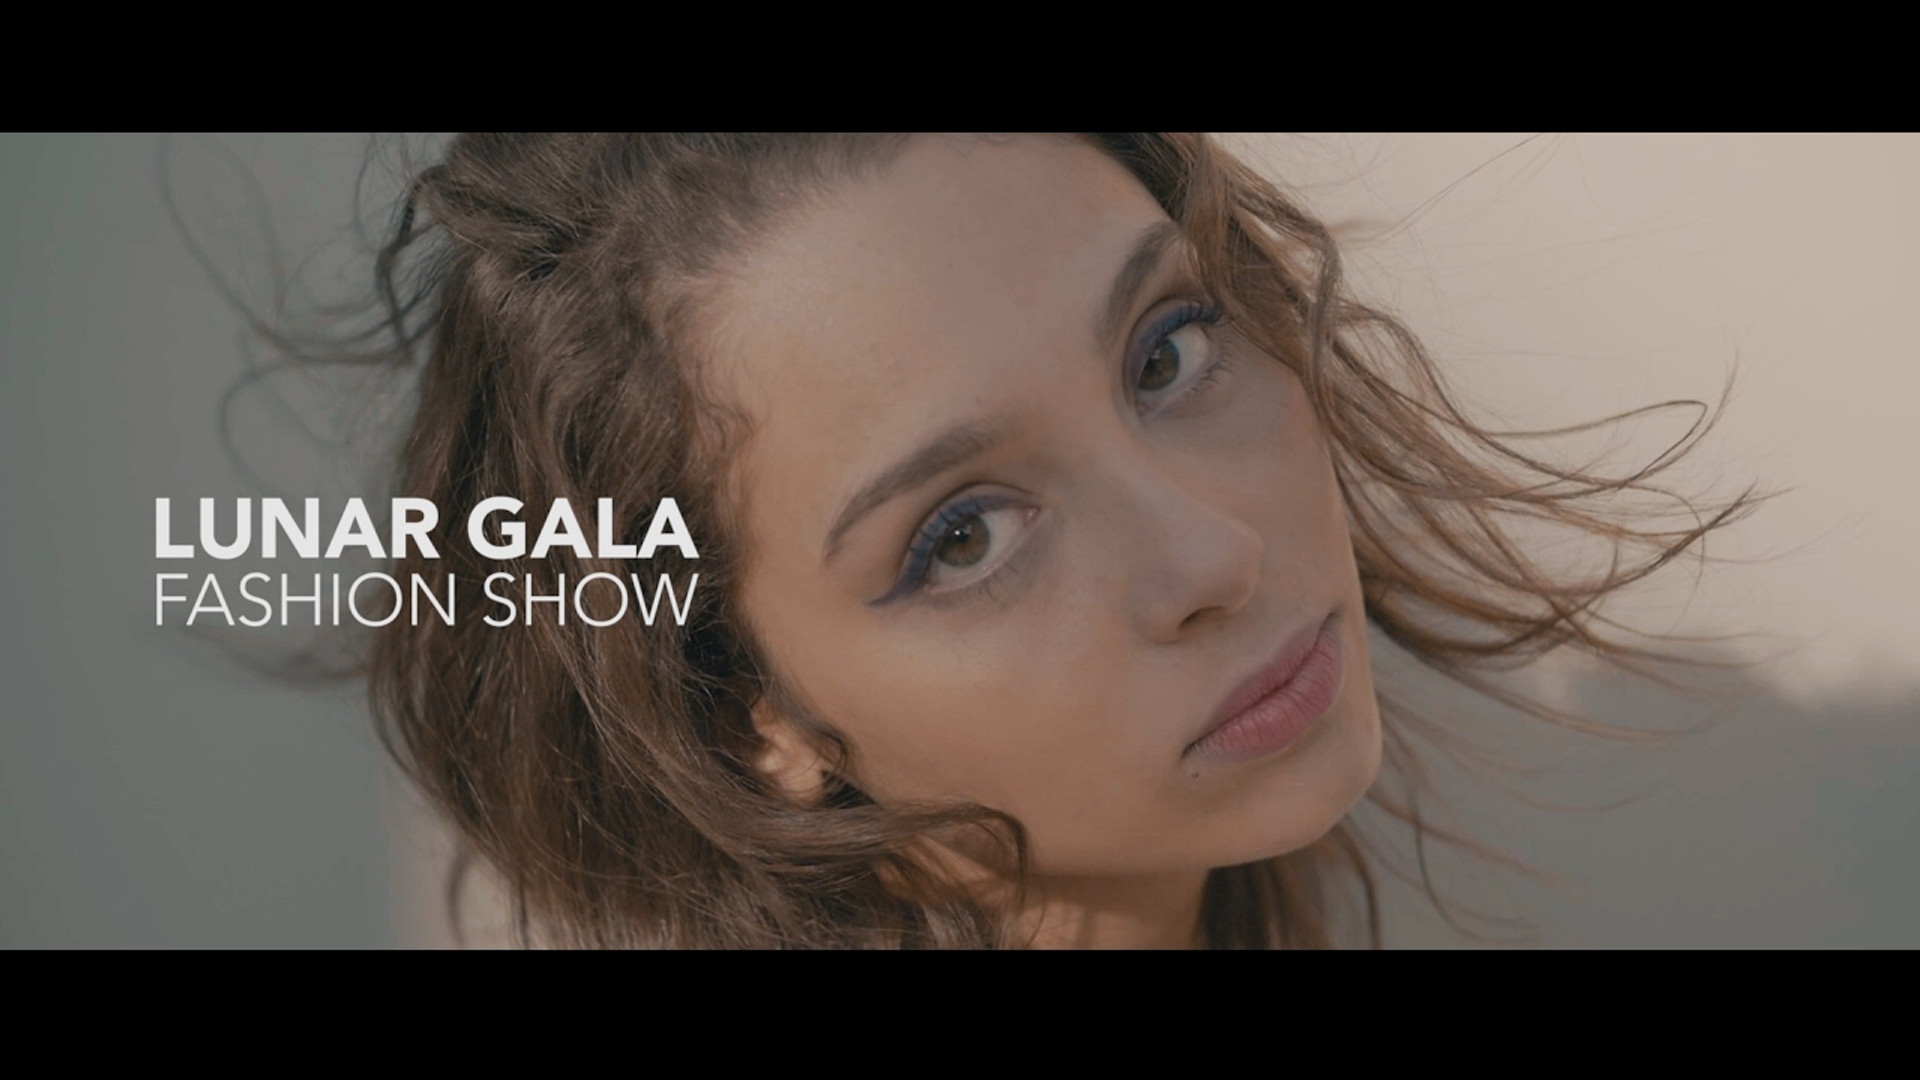 Lunar Gala   Harmony (Promo)   GH4 + VisionColor LUTs